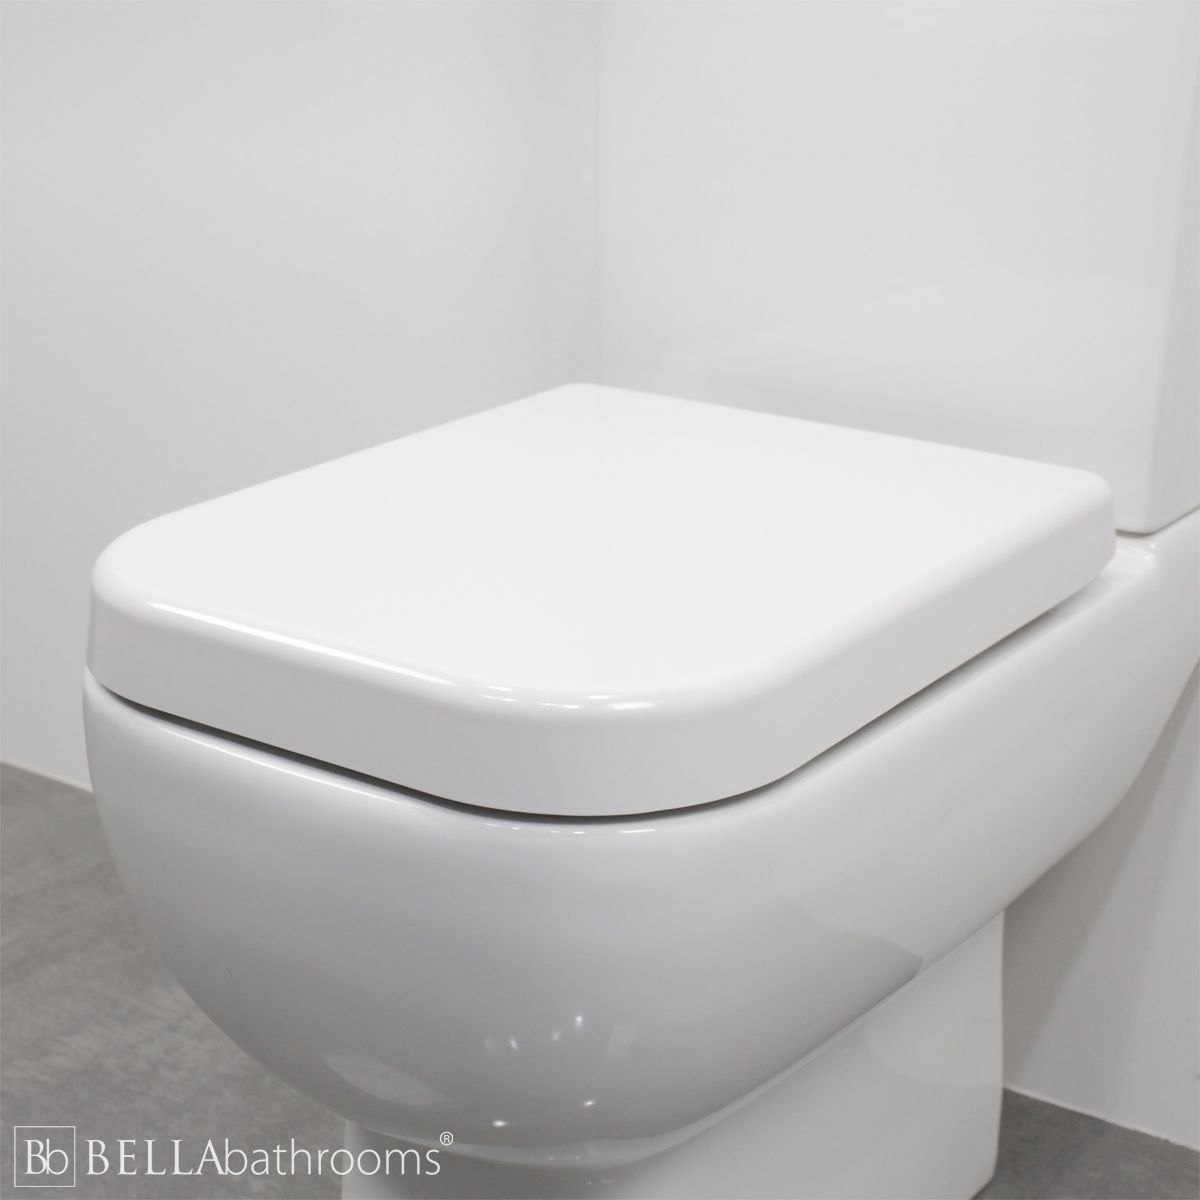 RAK Series 600 Standard Wrap Over Toilet Seat